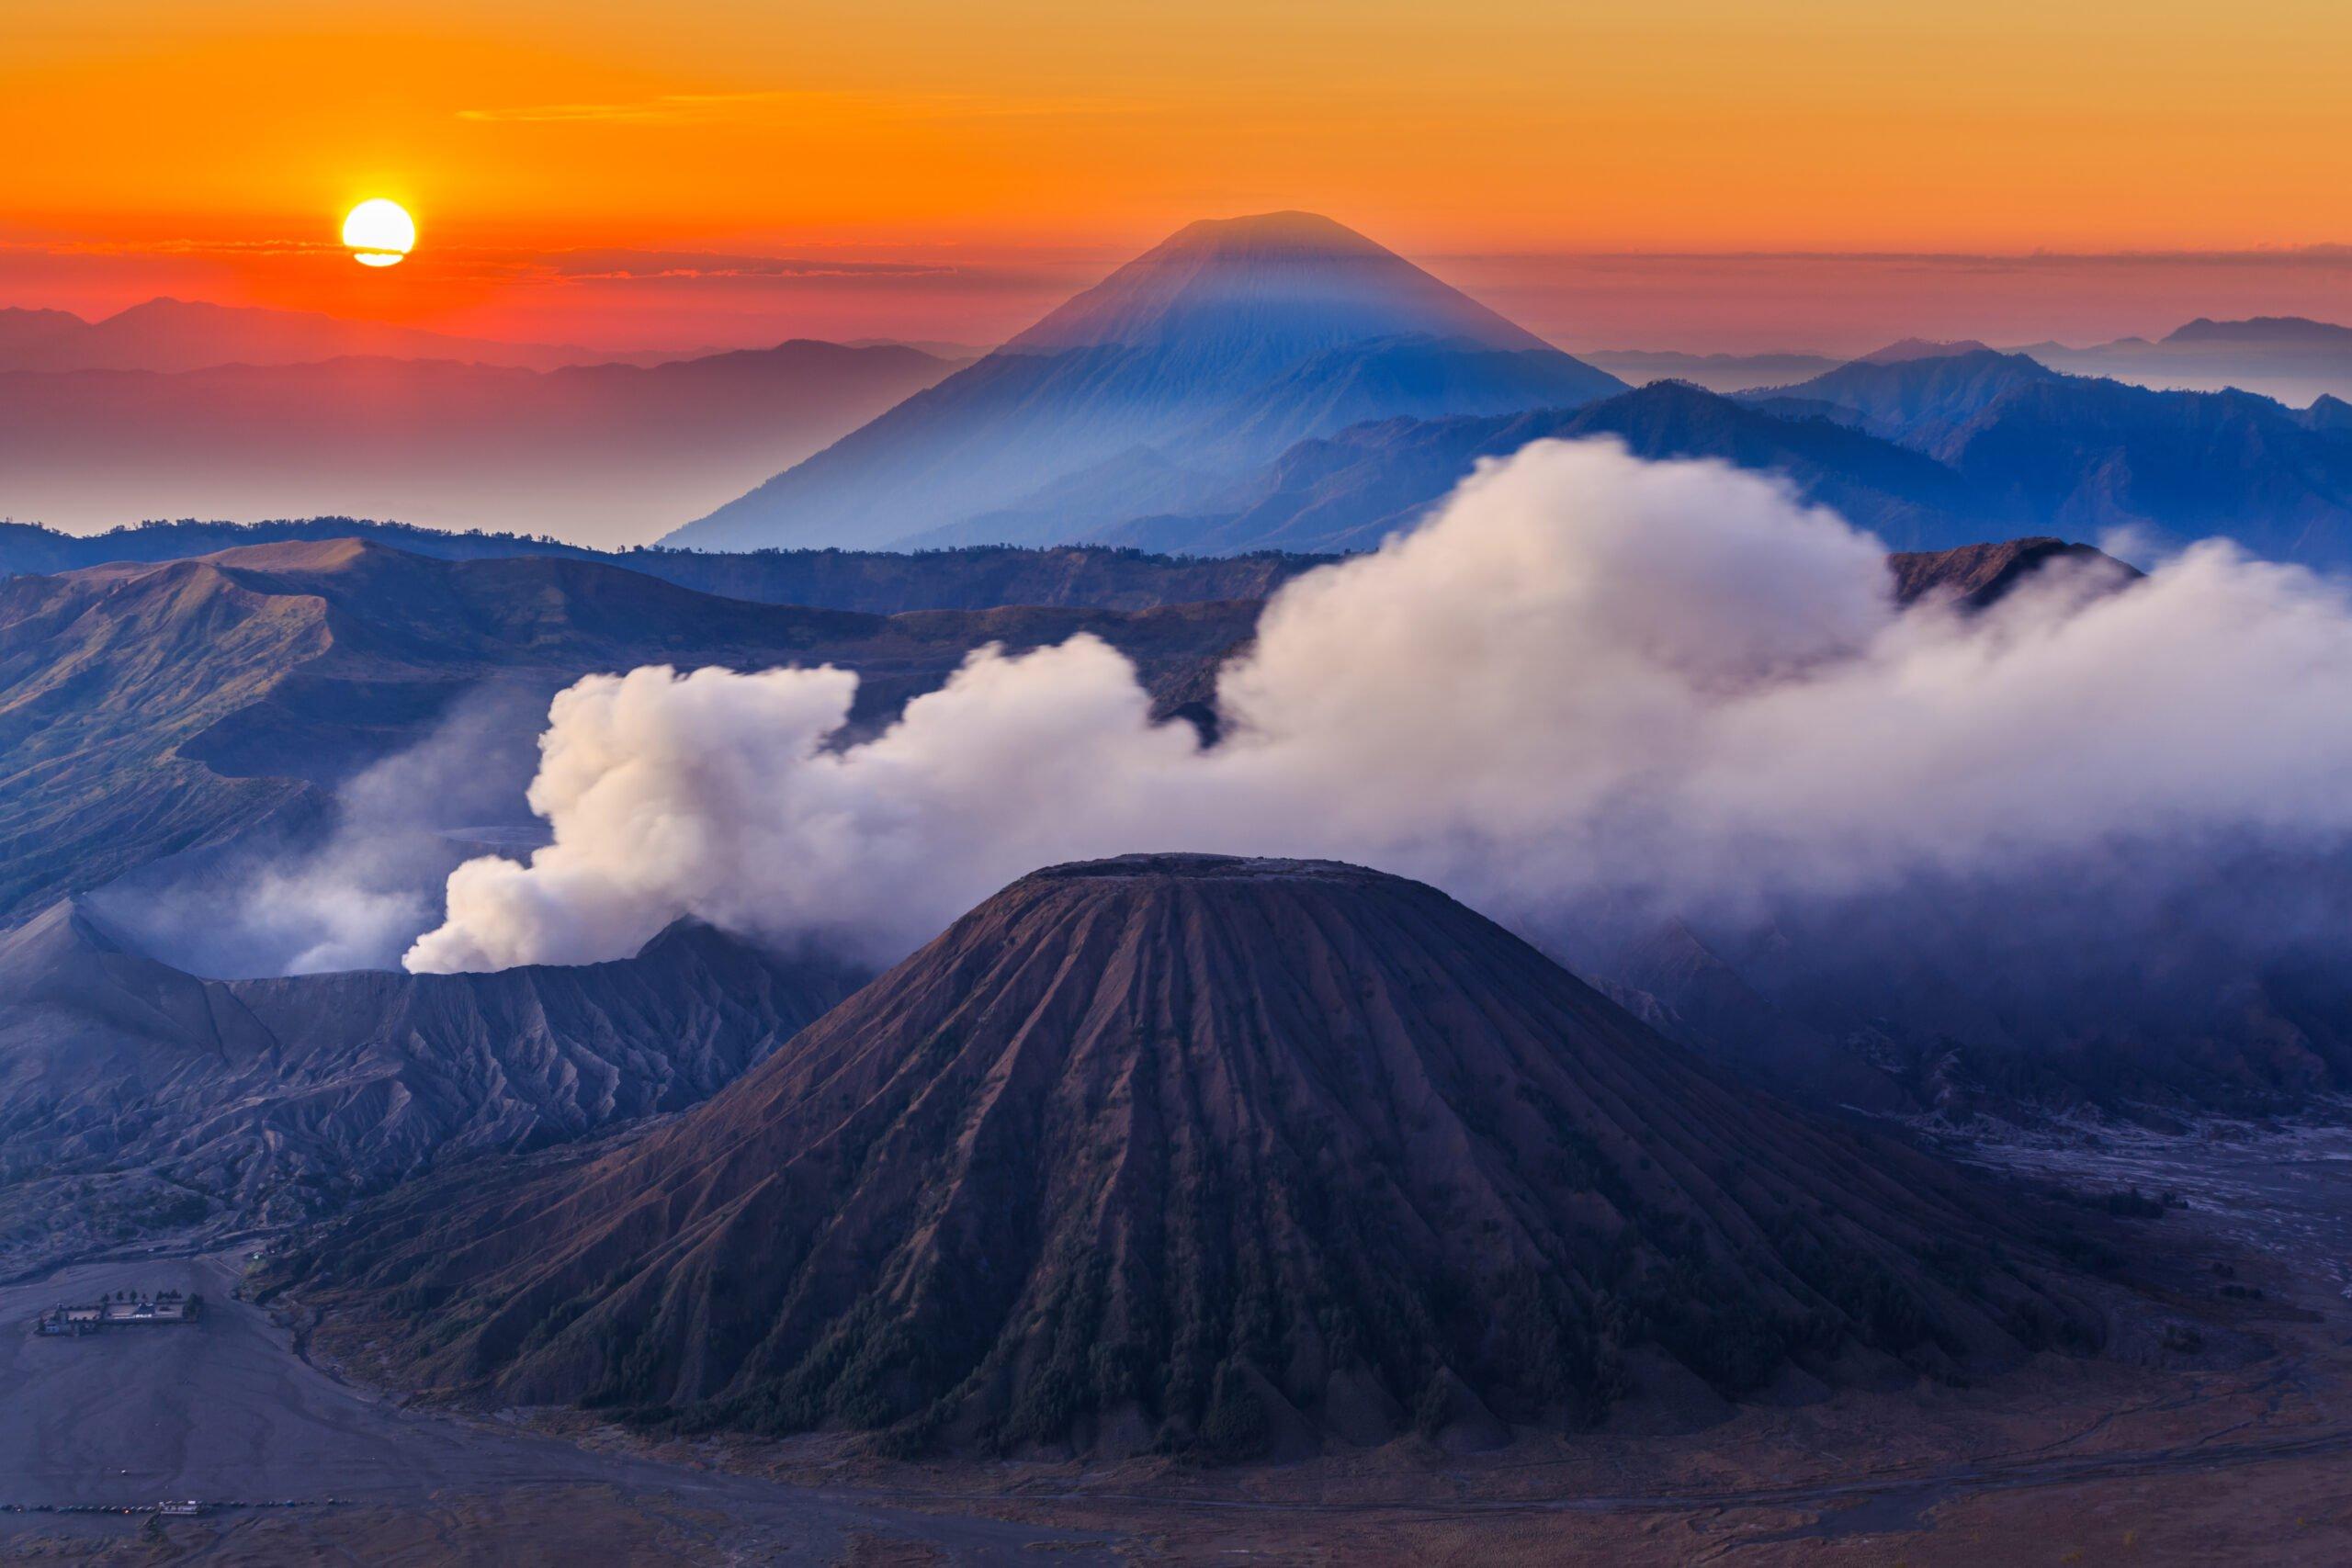 Mount Bromo - Mountain in Indonesia - Thousand Wonders